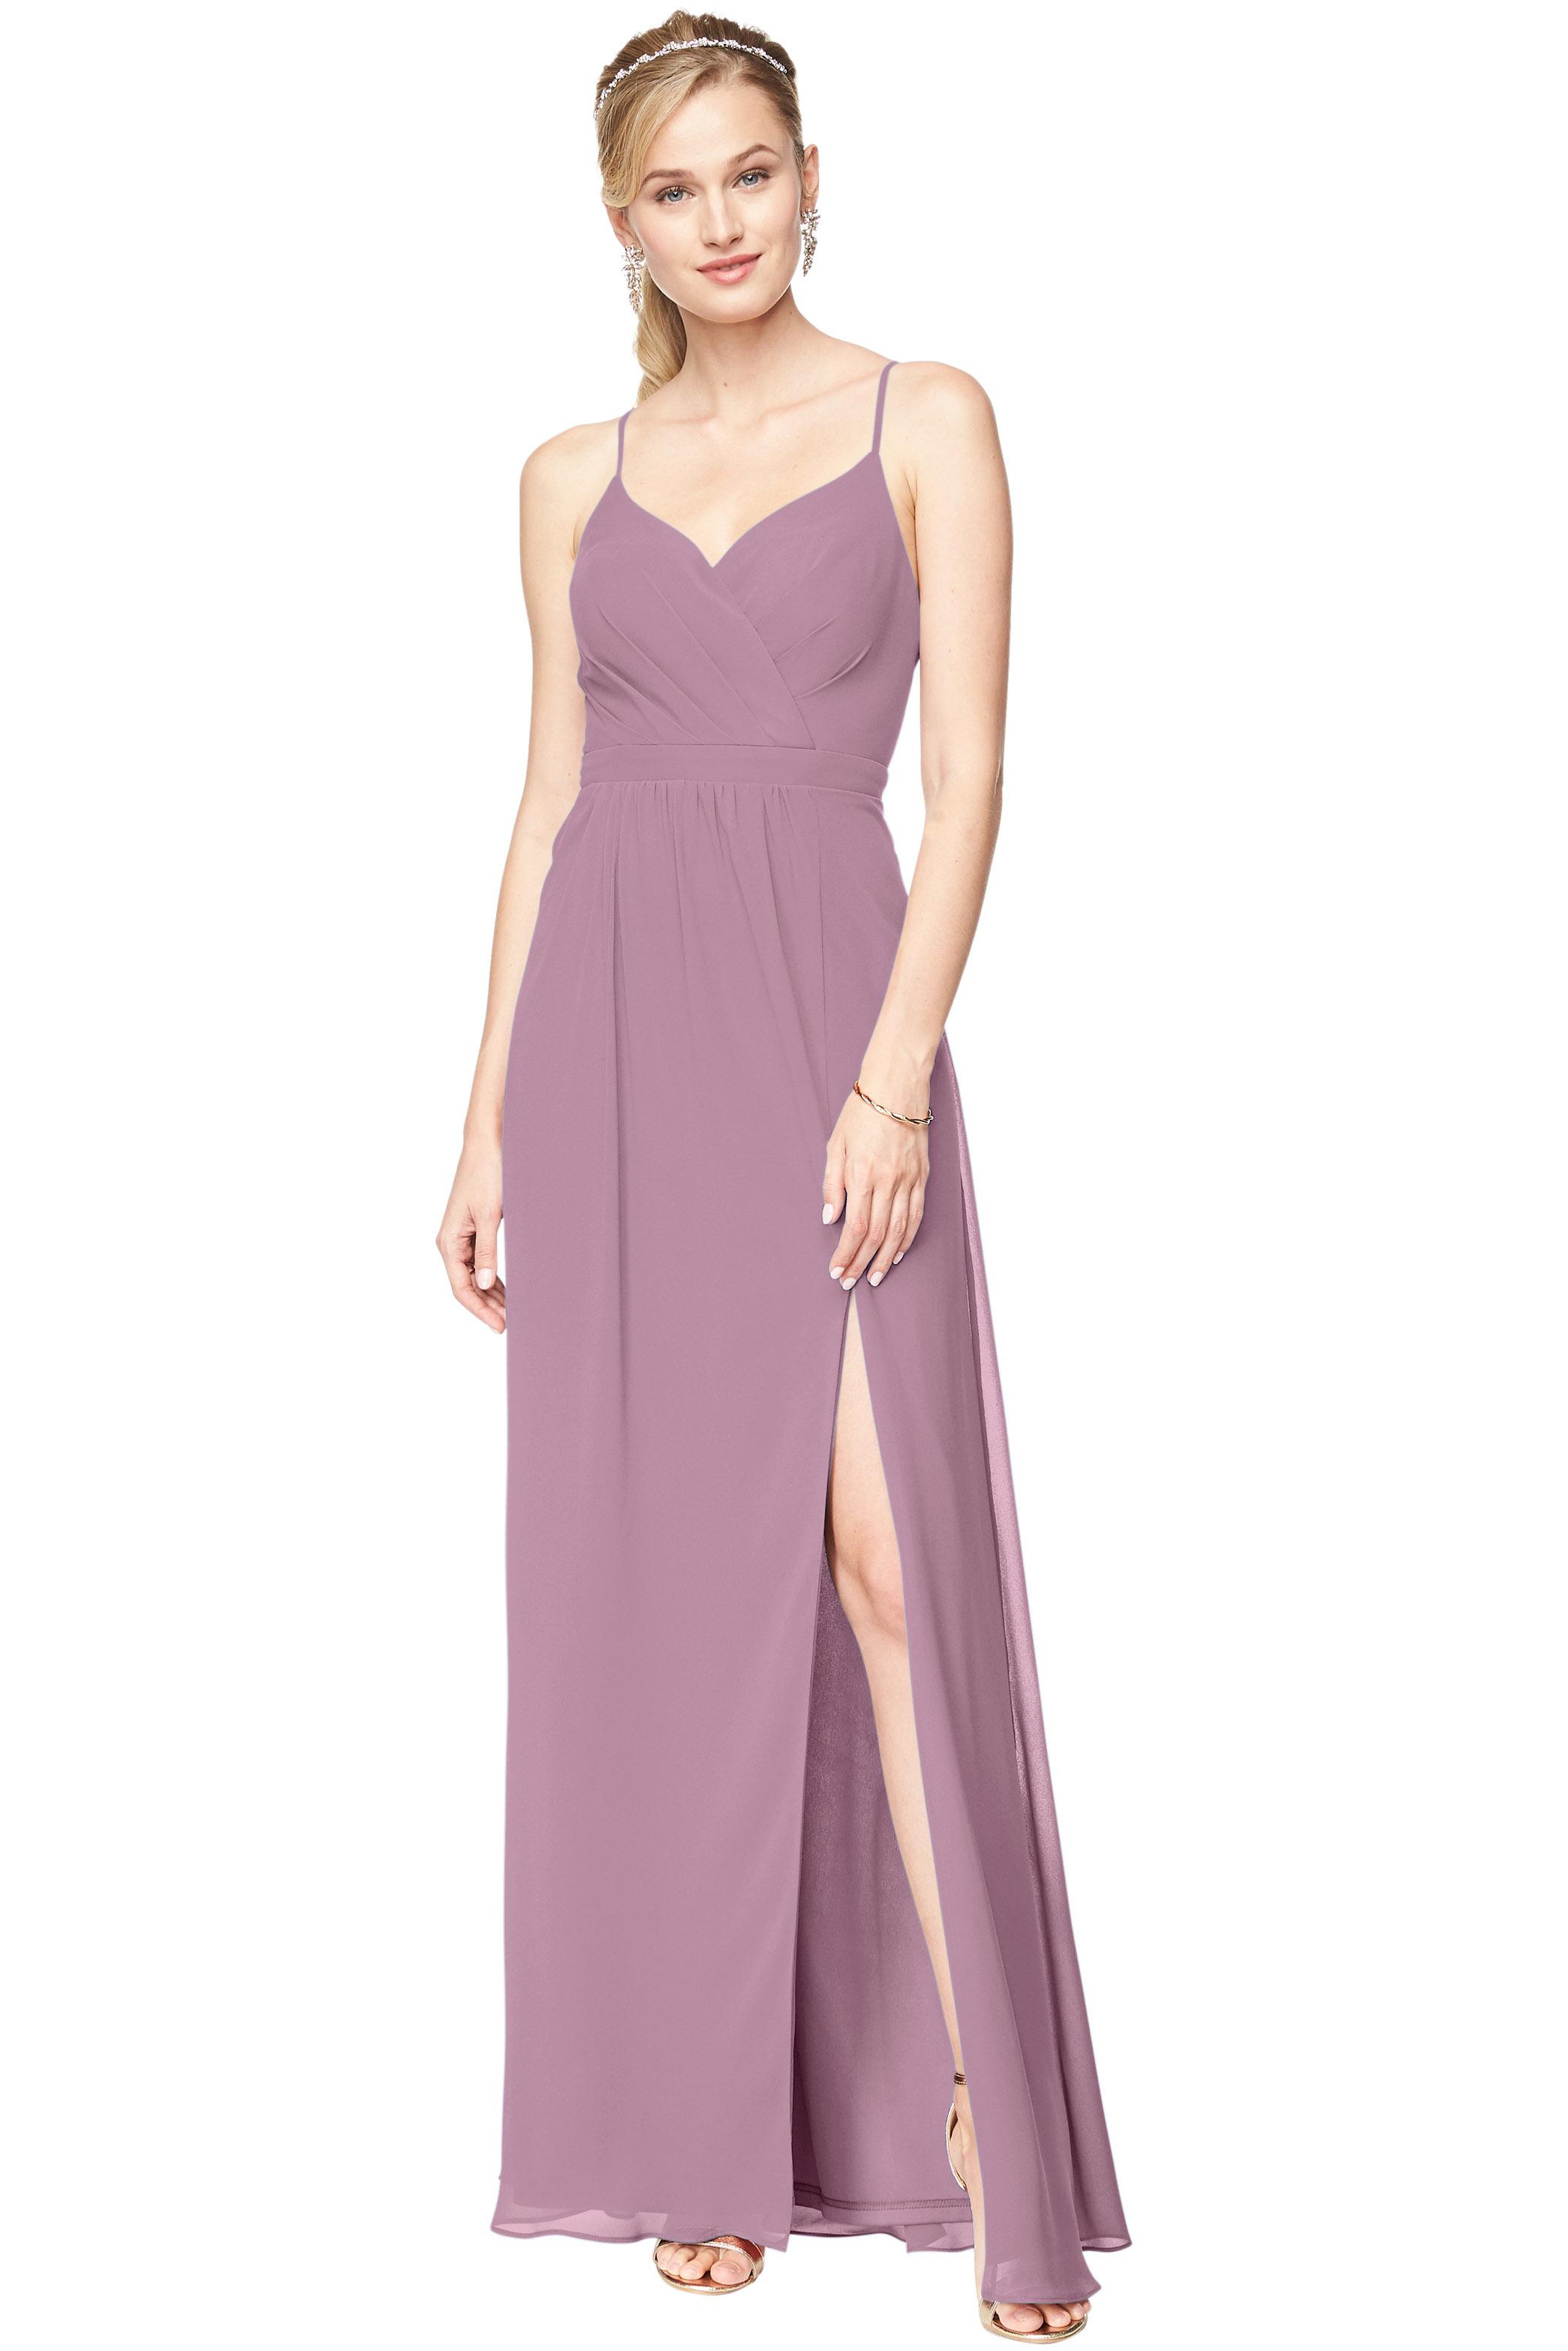 Bill Levkoff WISTERIA Chiffon Surplice A-Line gown, $178.00 Front